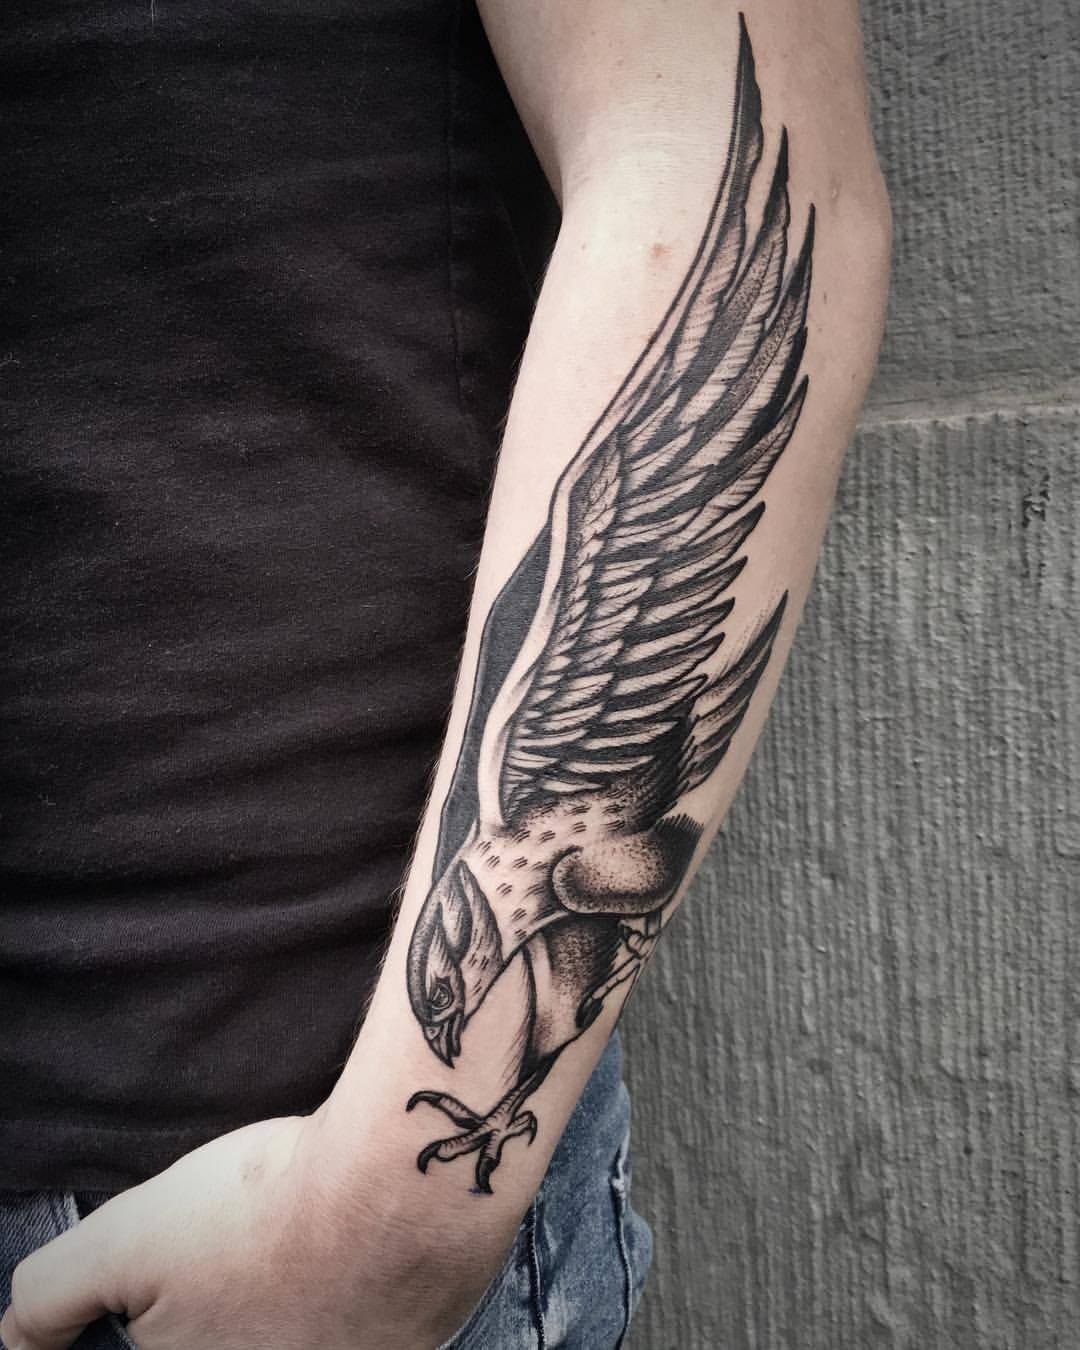 Bobby Anders Tatuaż Pomysły Na Tatuaż Tatuaż I Tatuaże